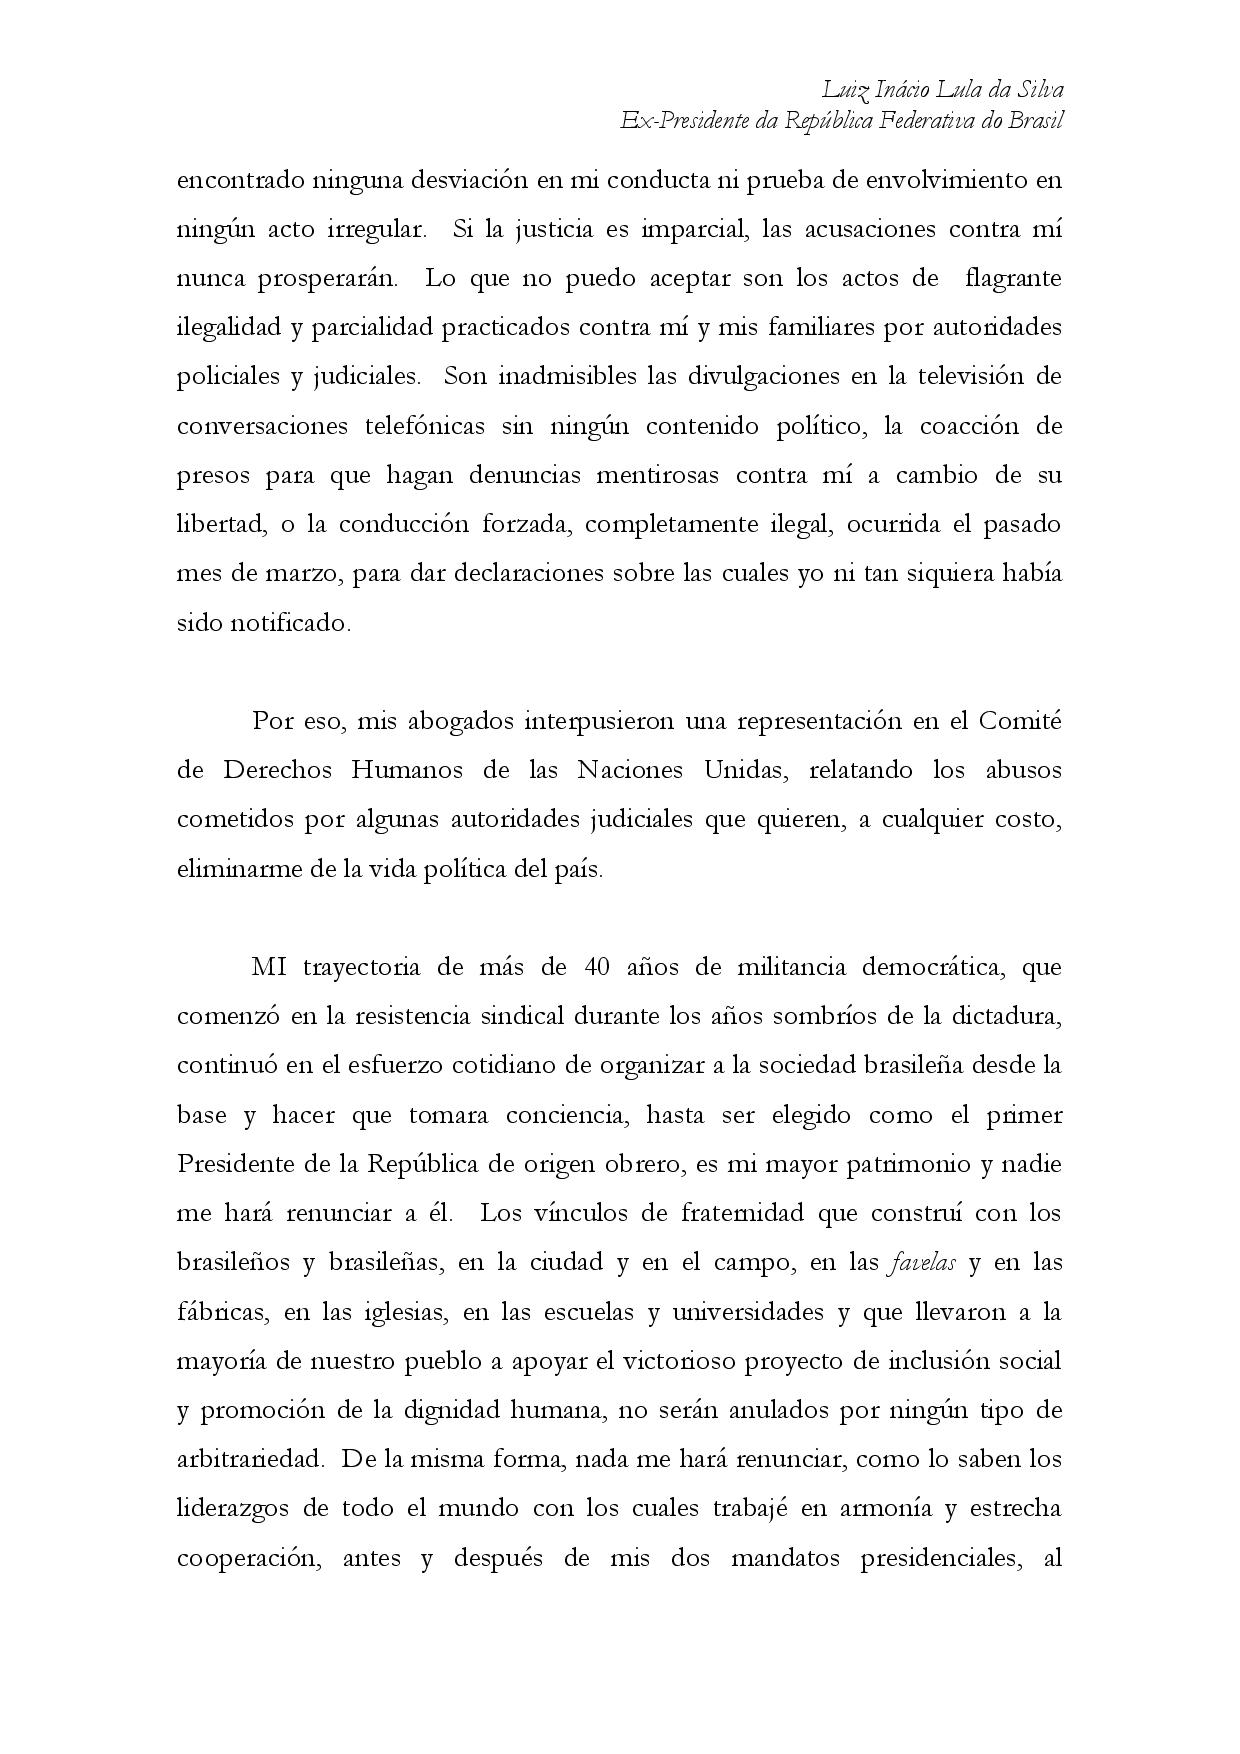 Argentina Ex-presidenta-page-006